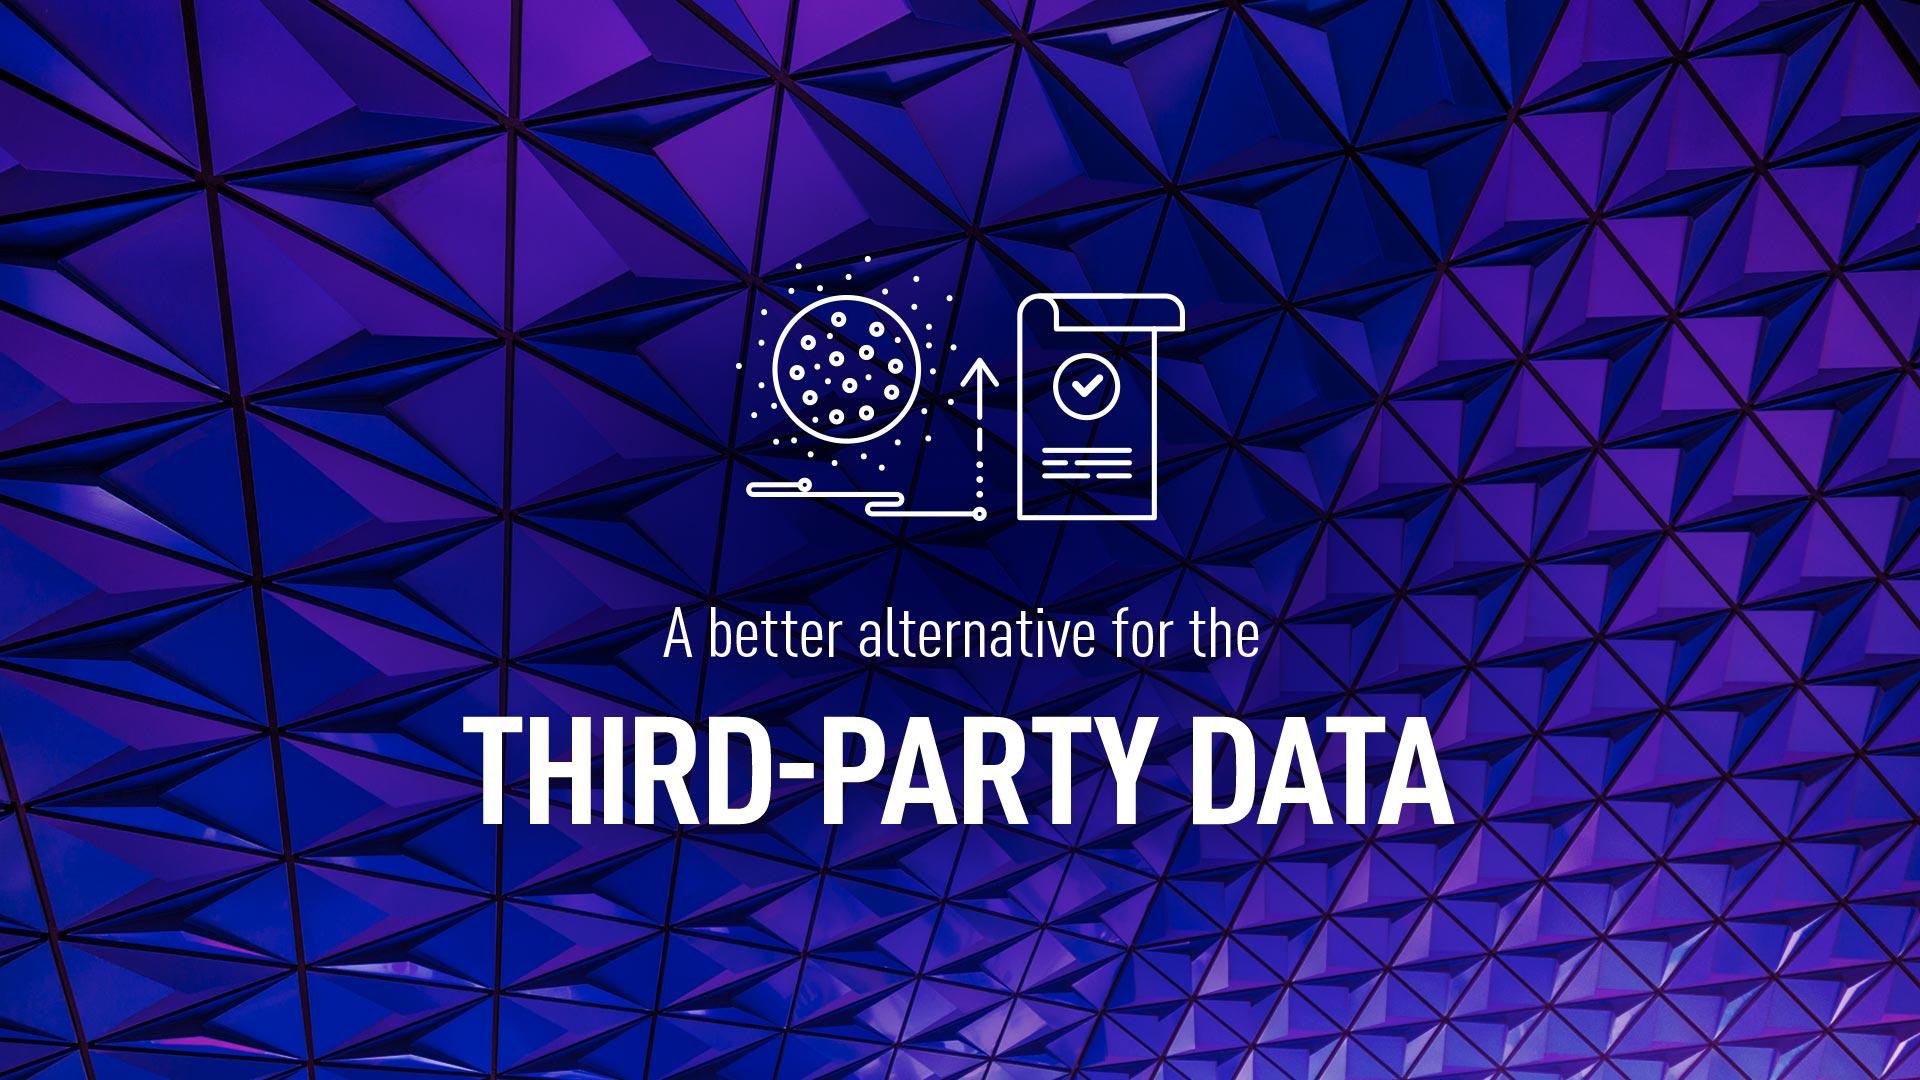 Third party data alternative